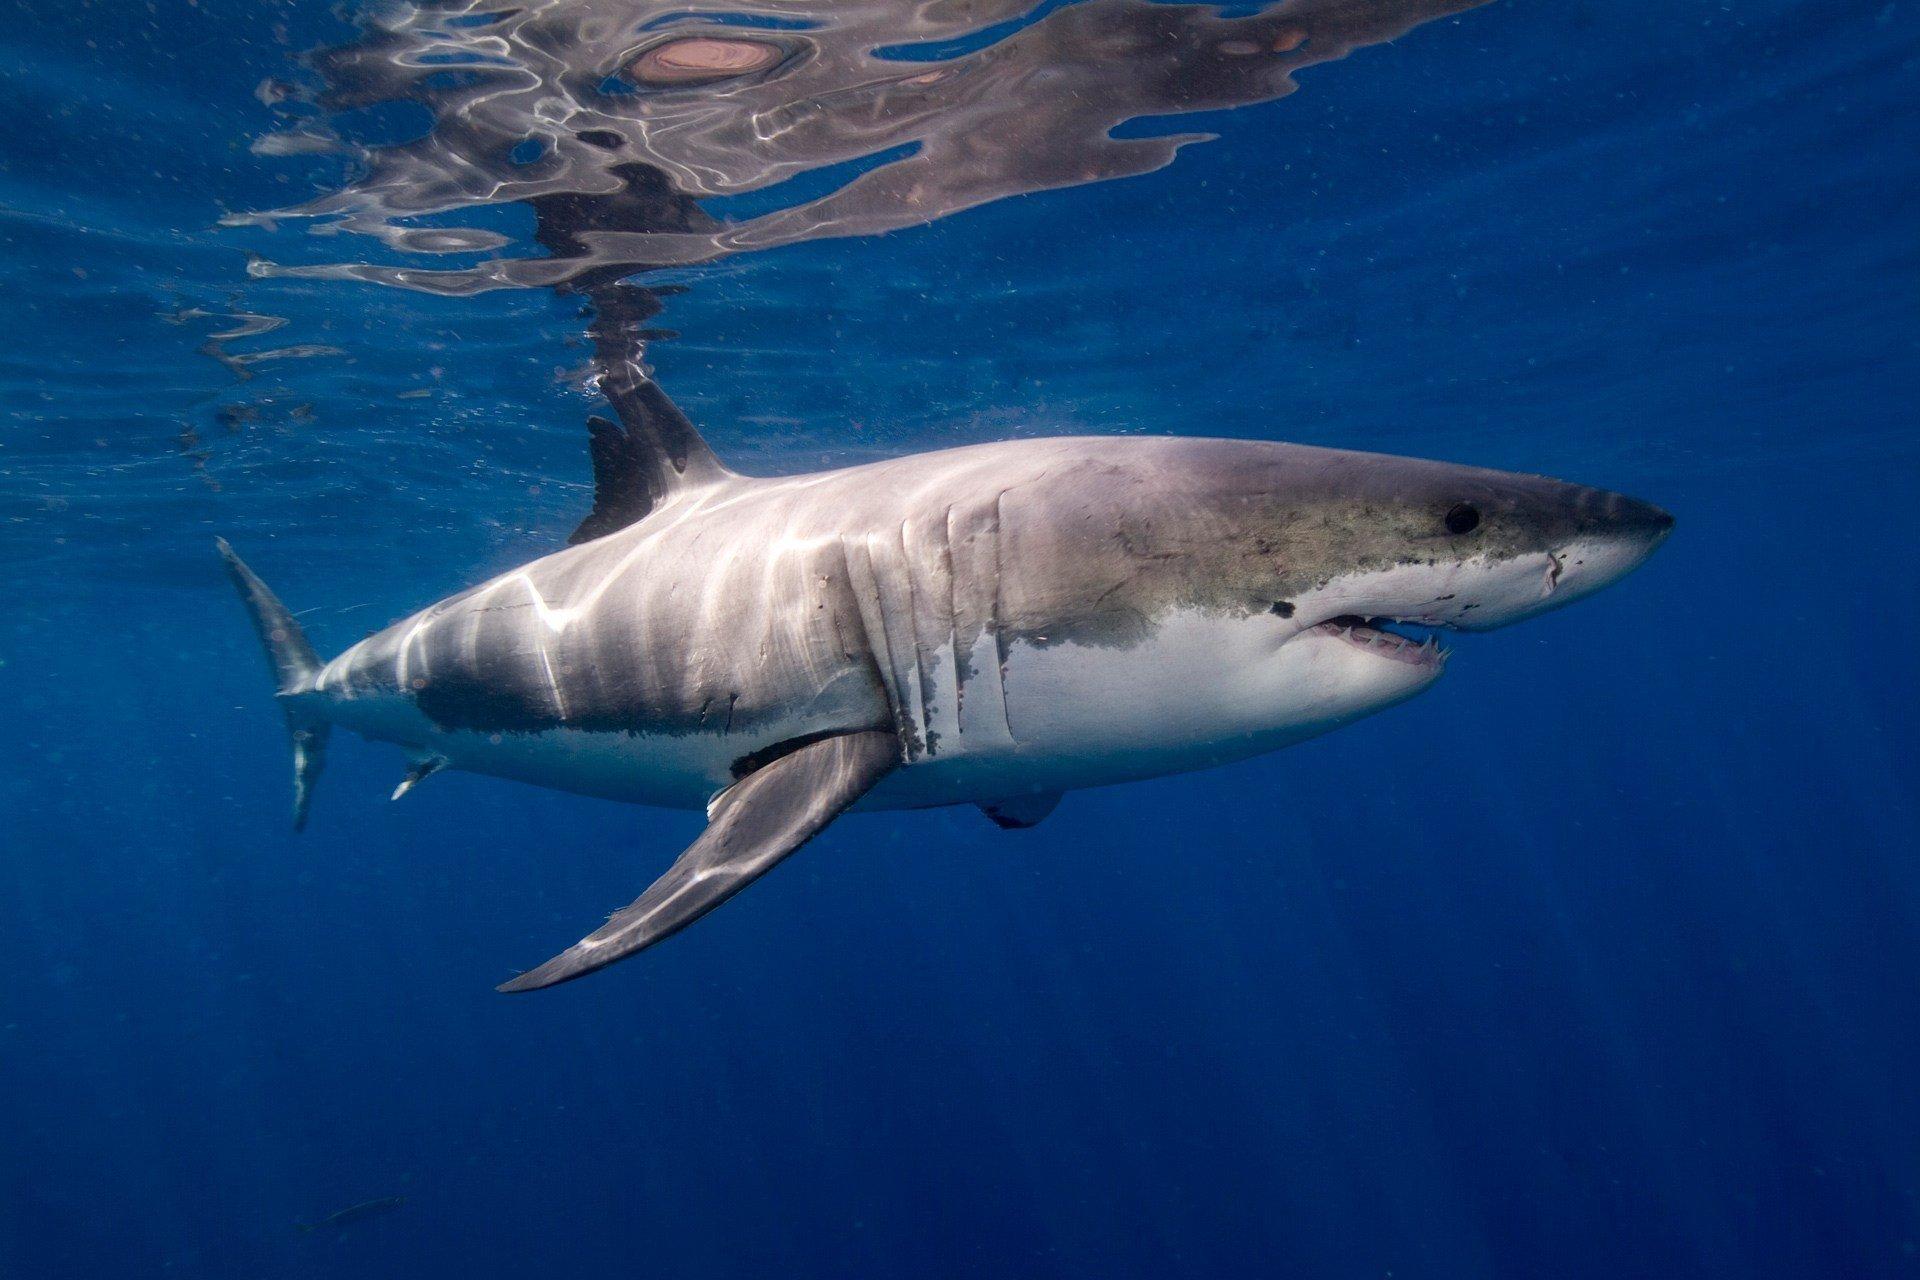 Pacific Coast Great White Shark Report